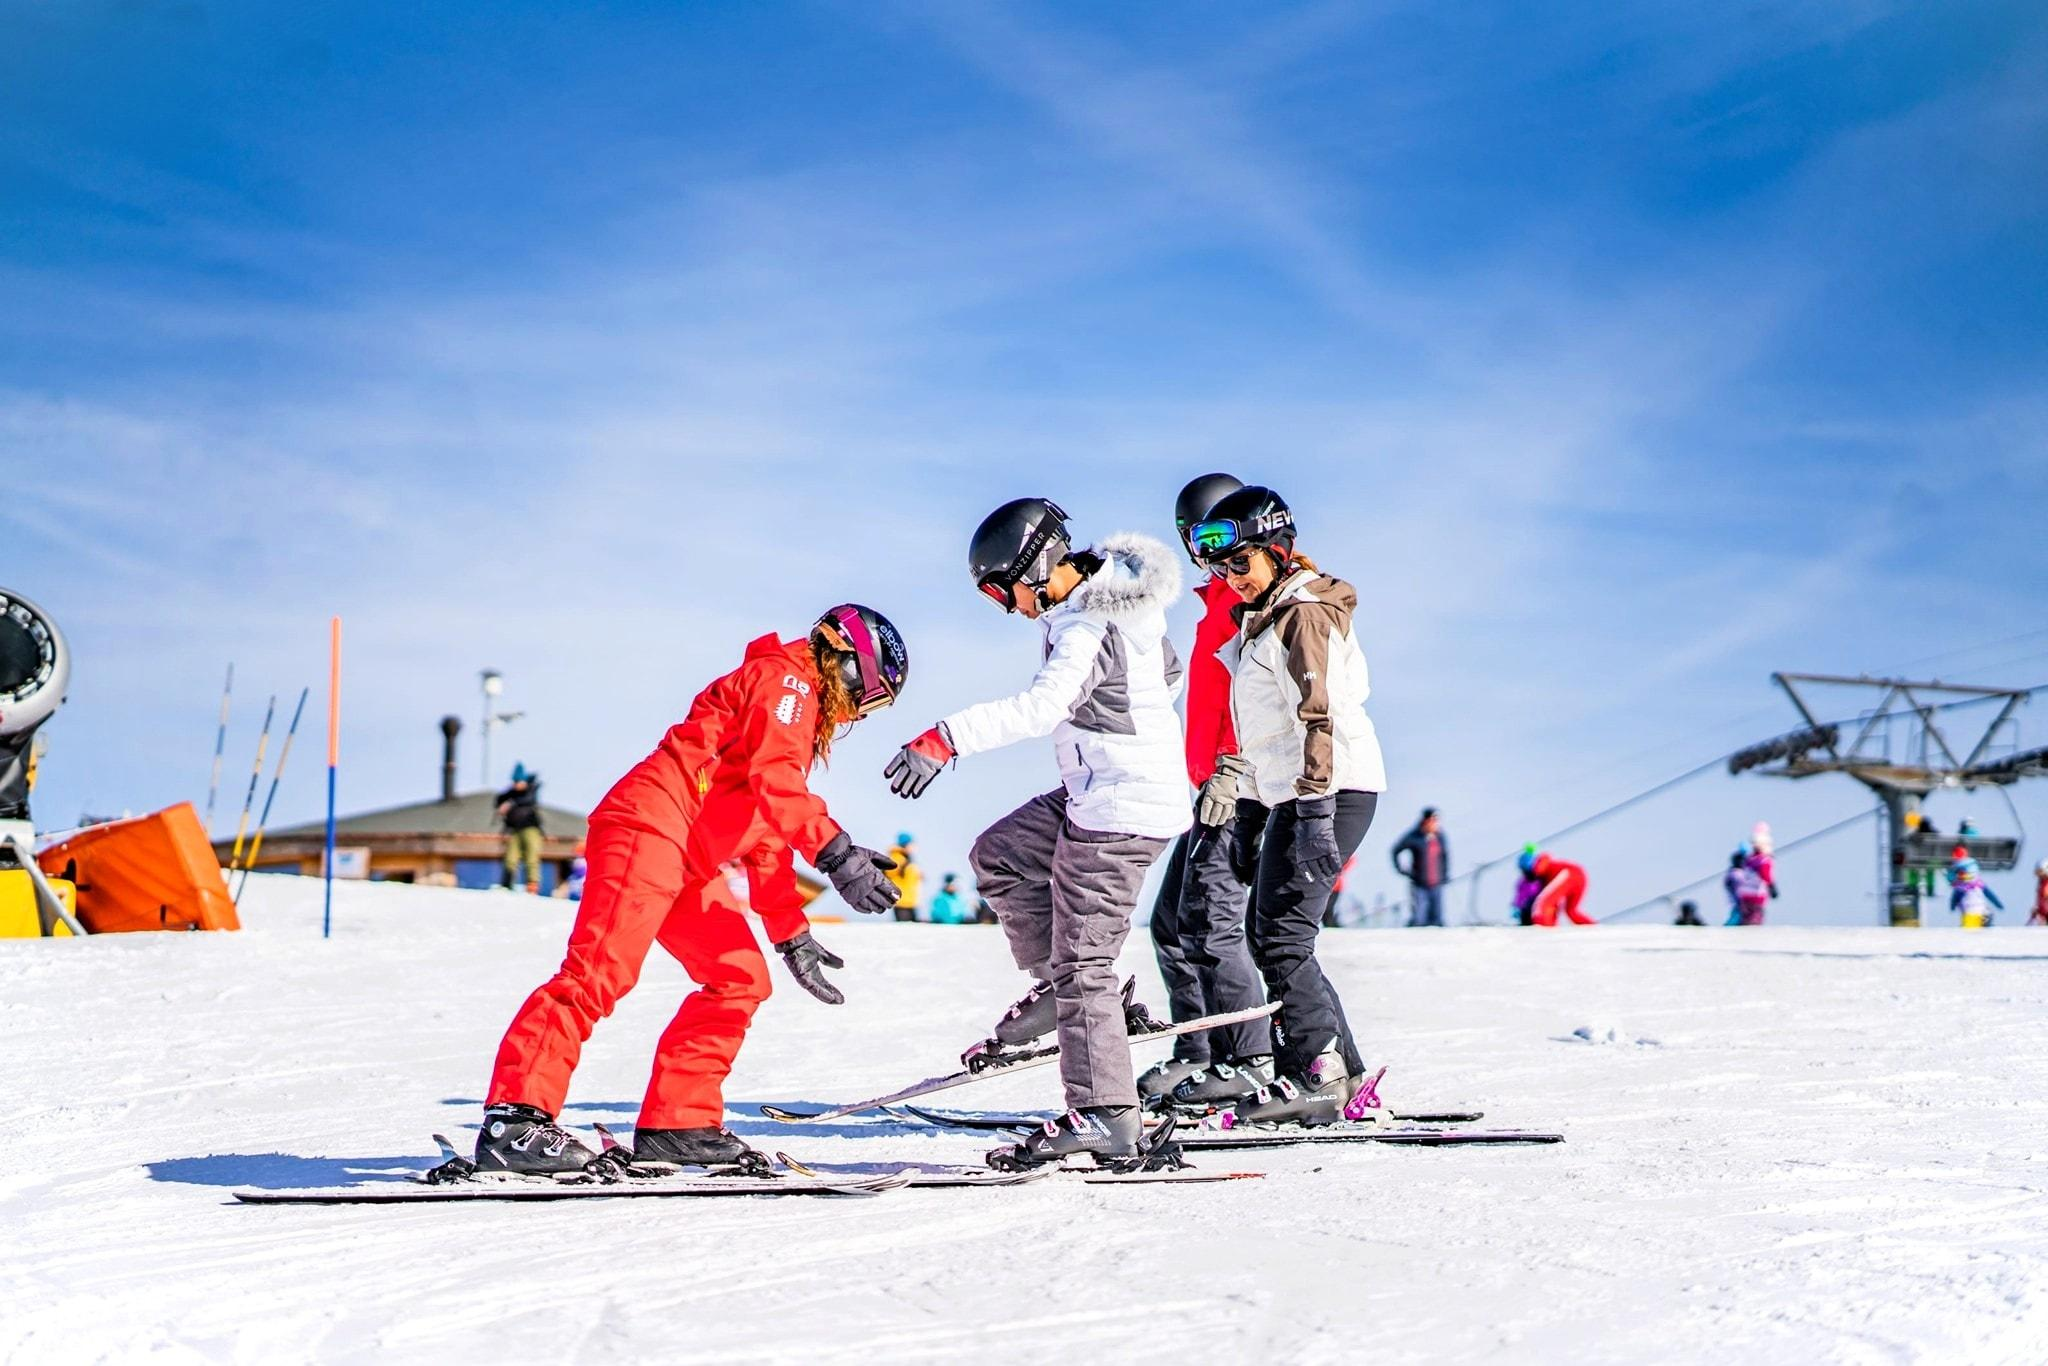 Lezioni di sci per adulti per tutti i livelli